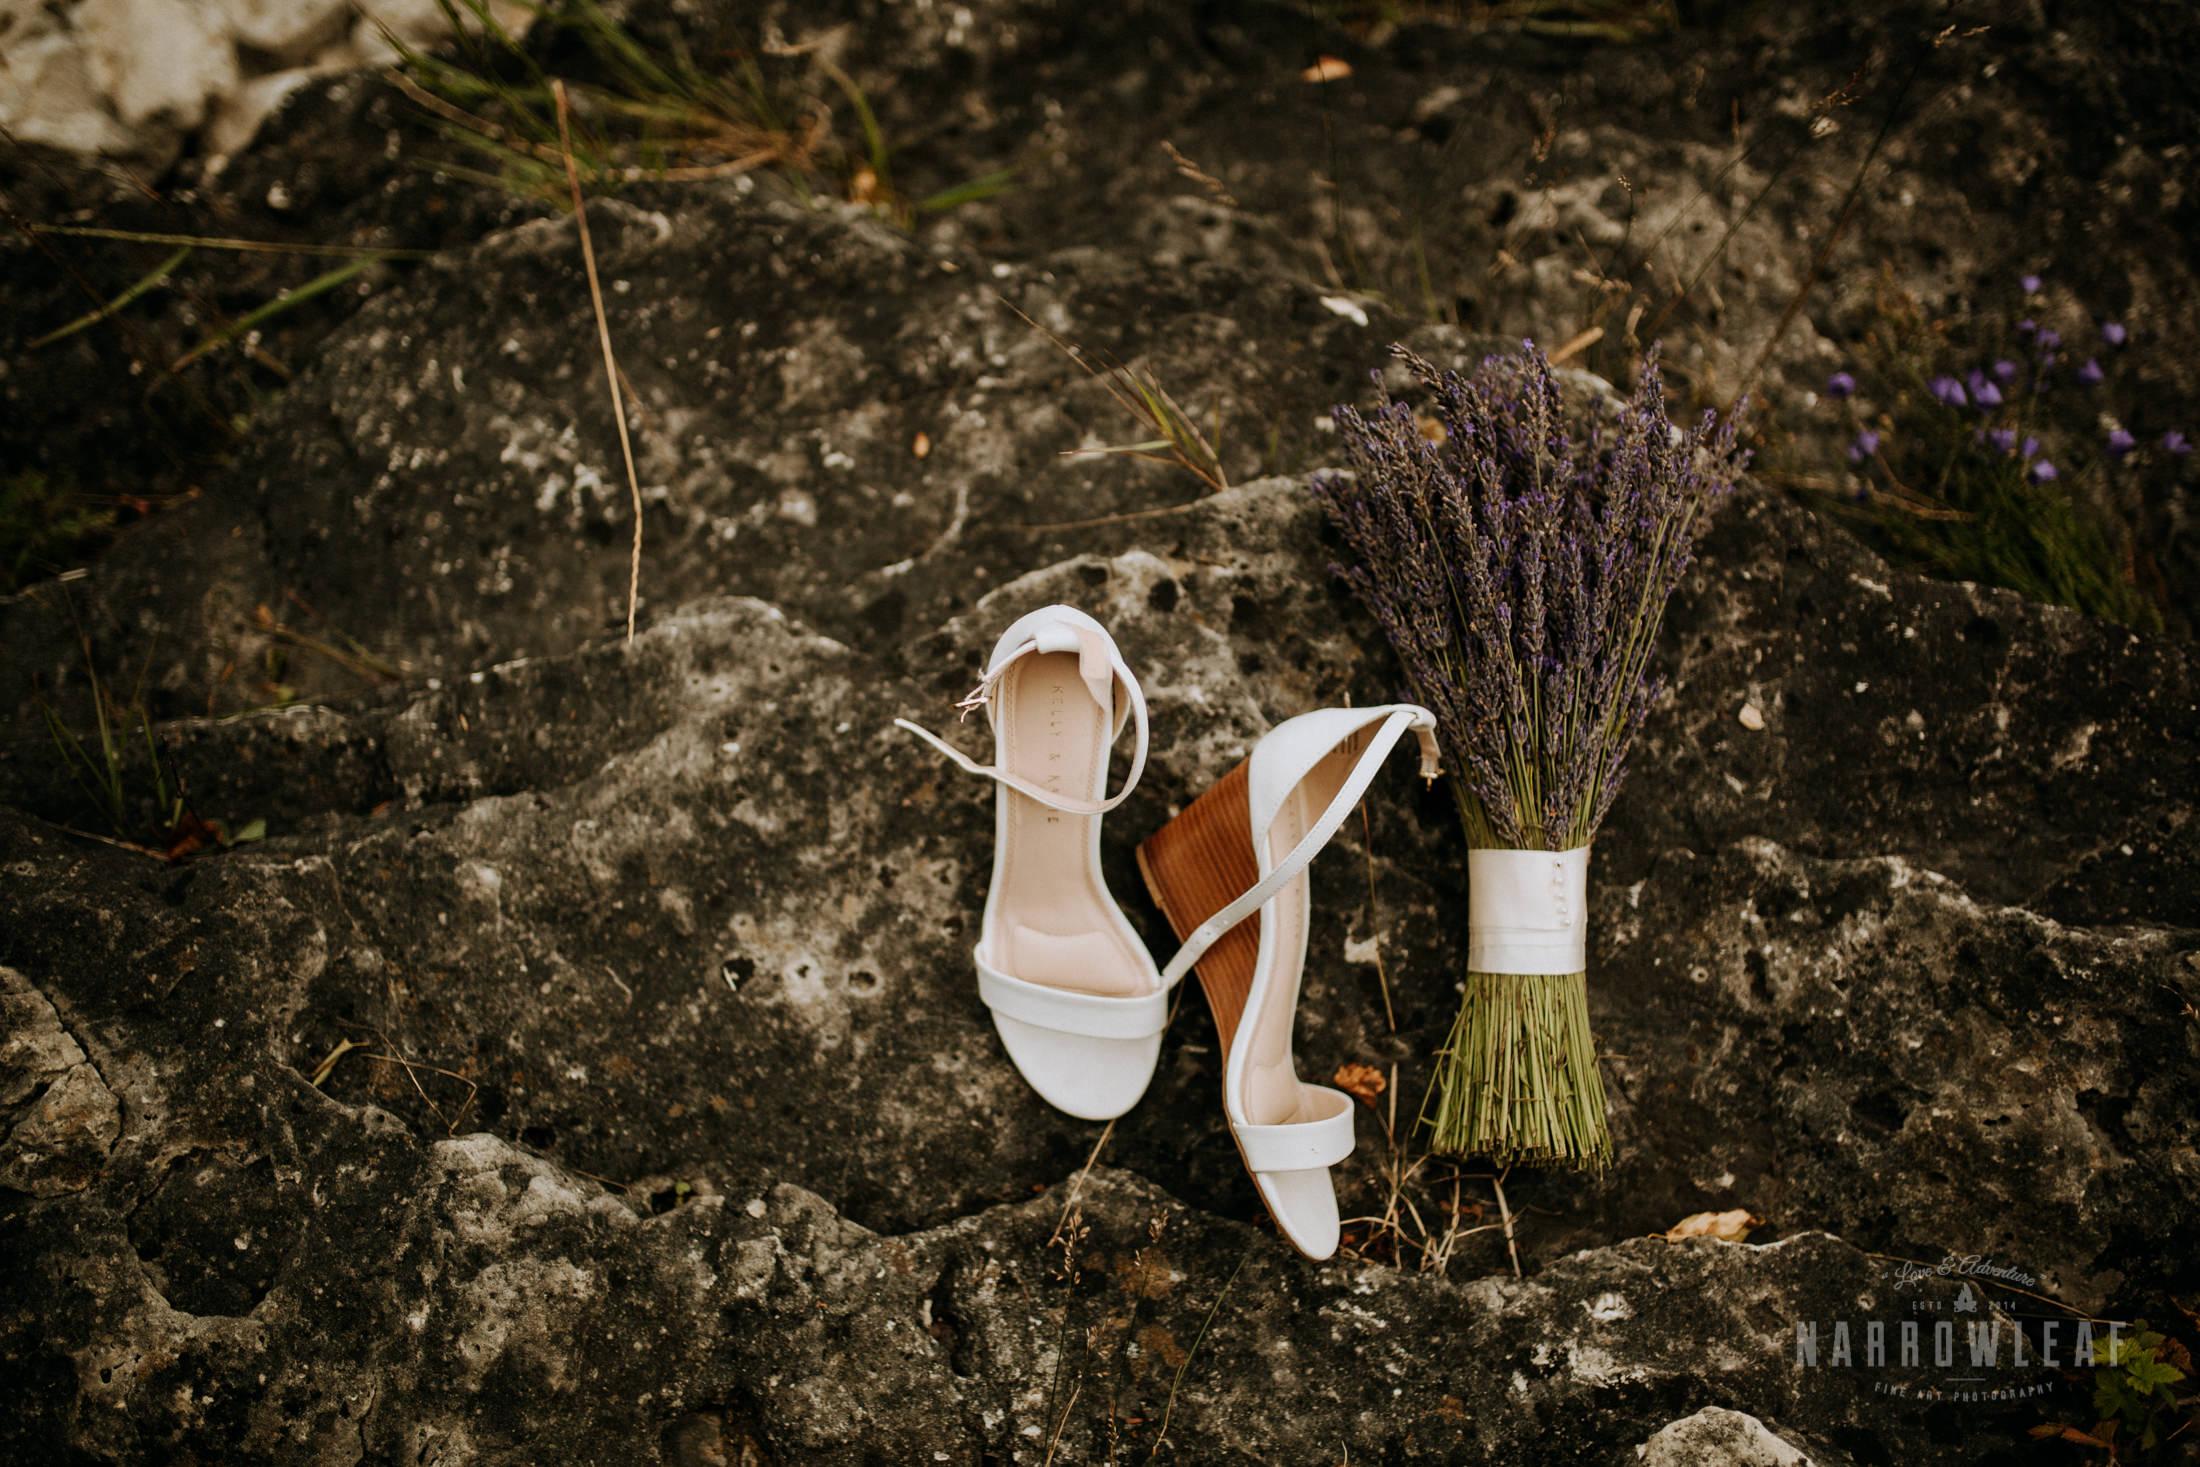 door-county-wedding-photographer-in-the-woods-Narrowleaf_Love_and_Adventure_Photography-8815.jpg